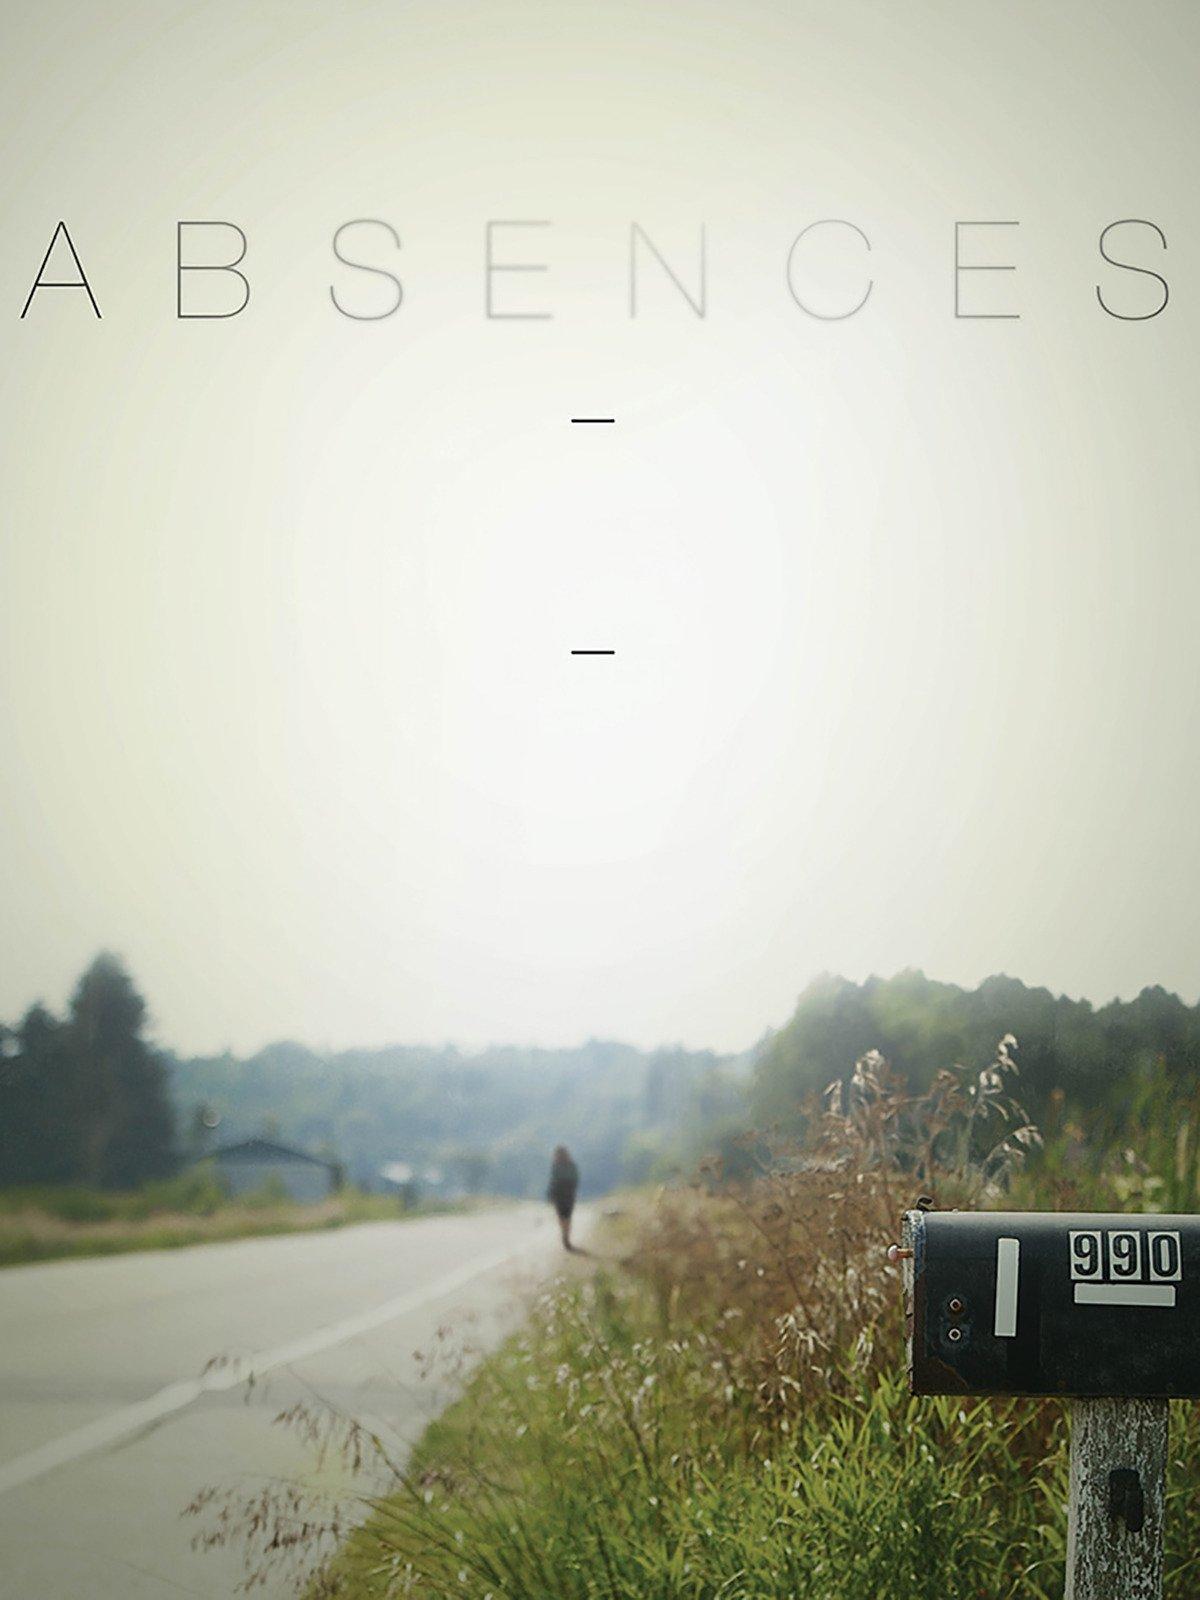 Absences